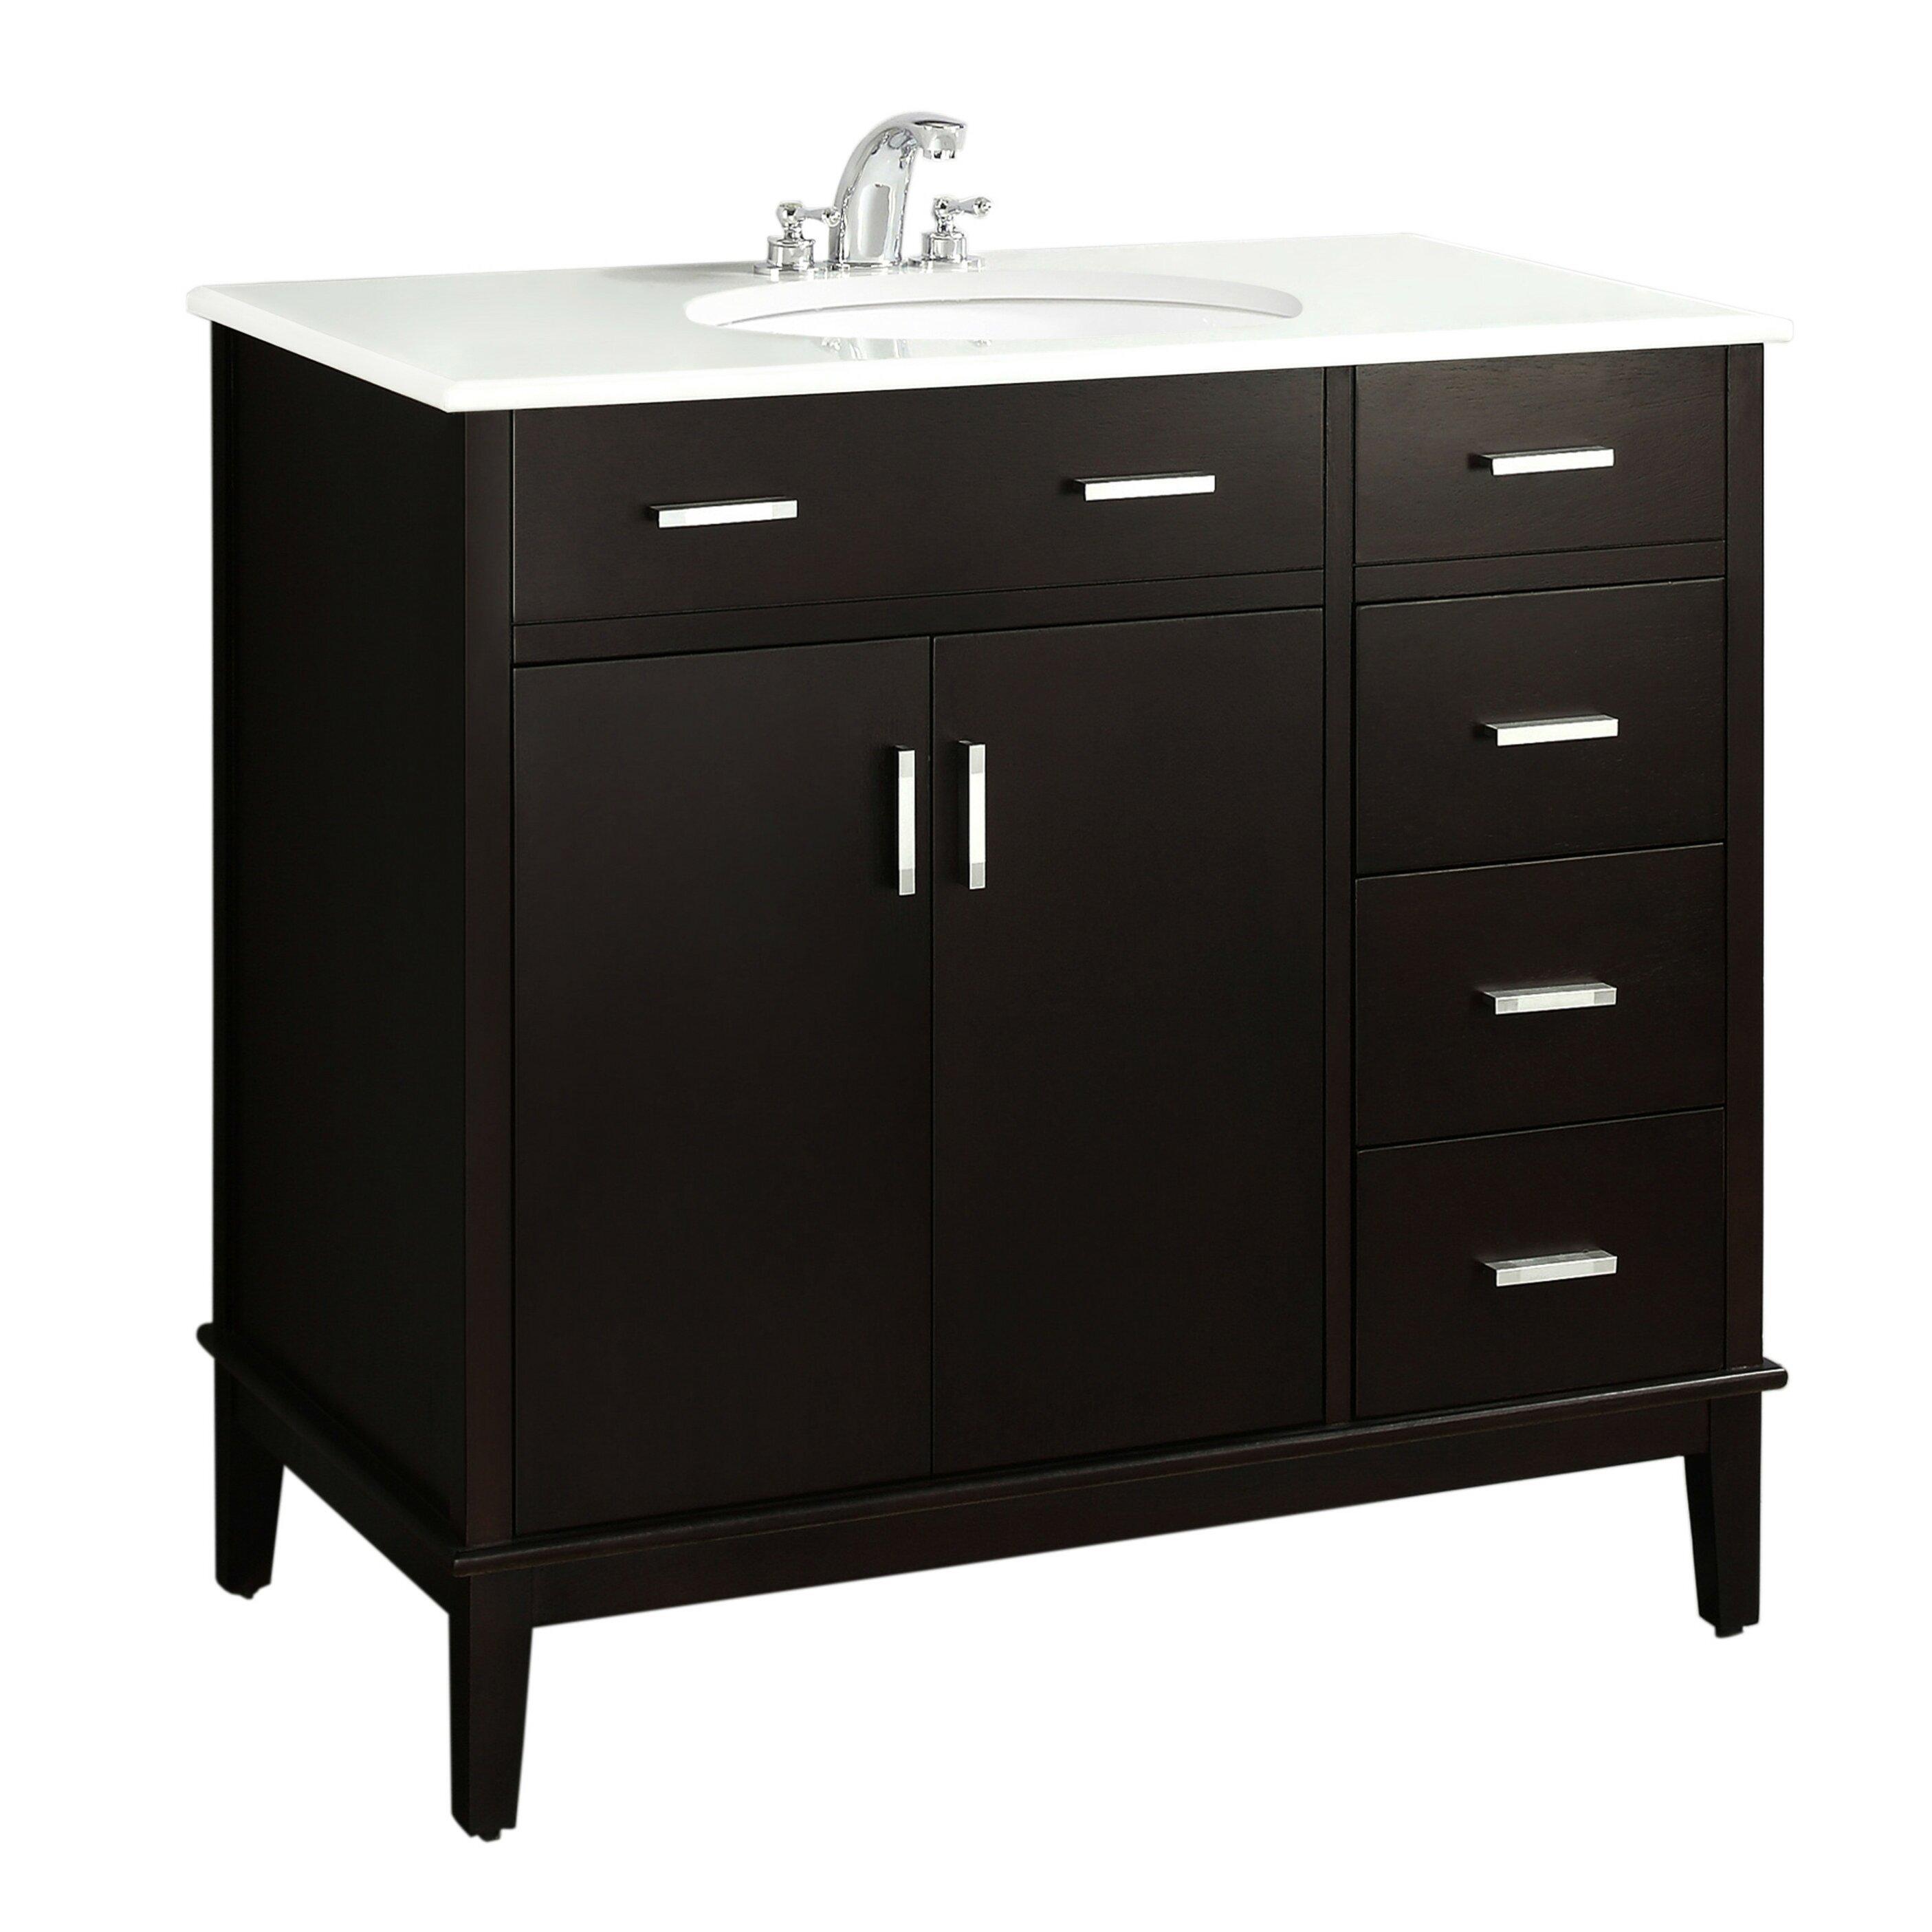 Simpli Home Urban Loft 36 quot  Single Bathroom Vanity Set. Simpli Home Urban Loft 36  Single Bathroom Vanity Set   Reviews